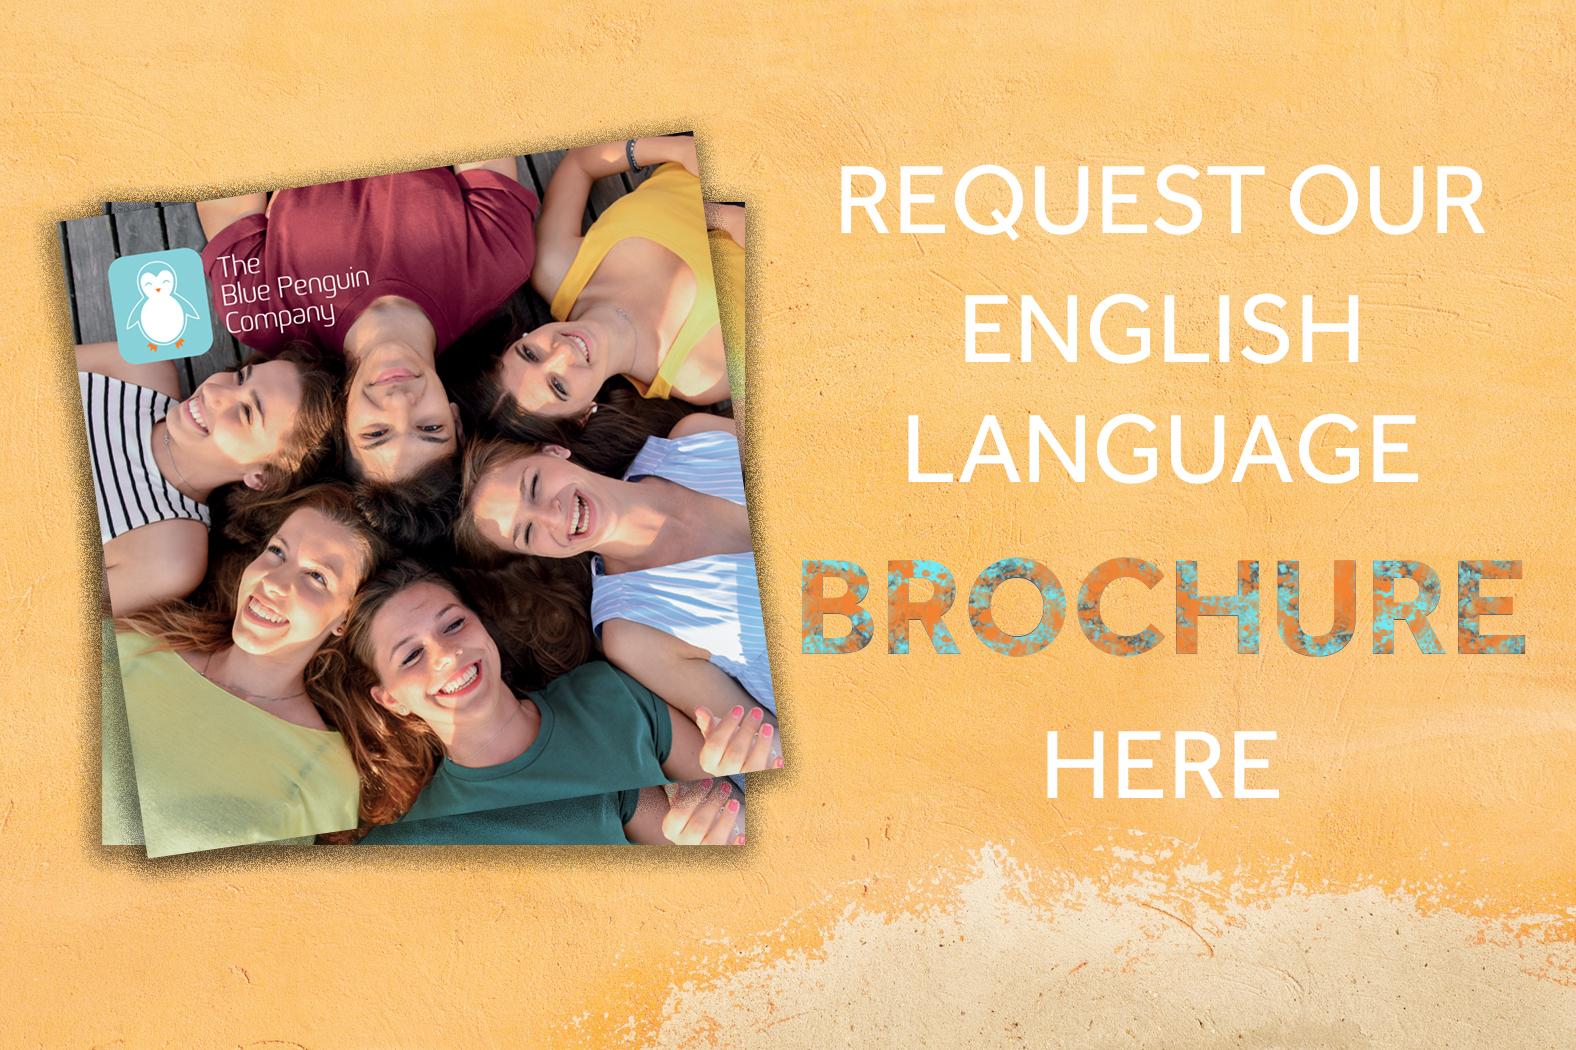 BluePenguin-Request-EnglishLanguage.jpg